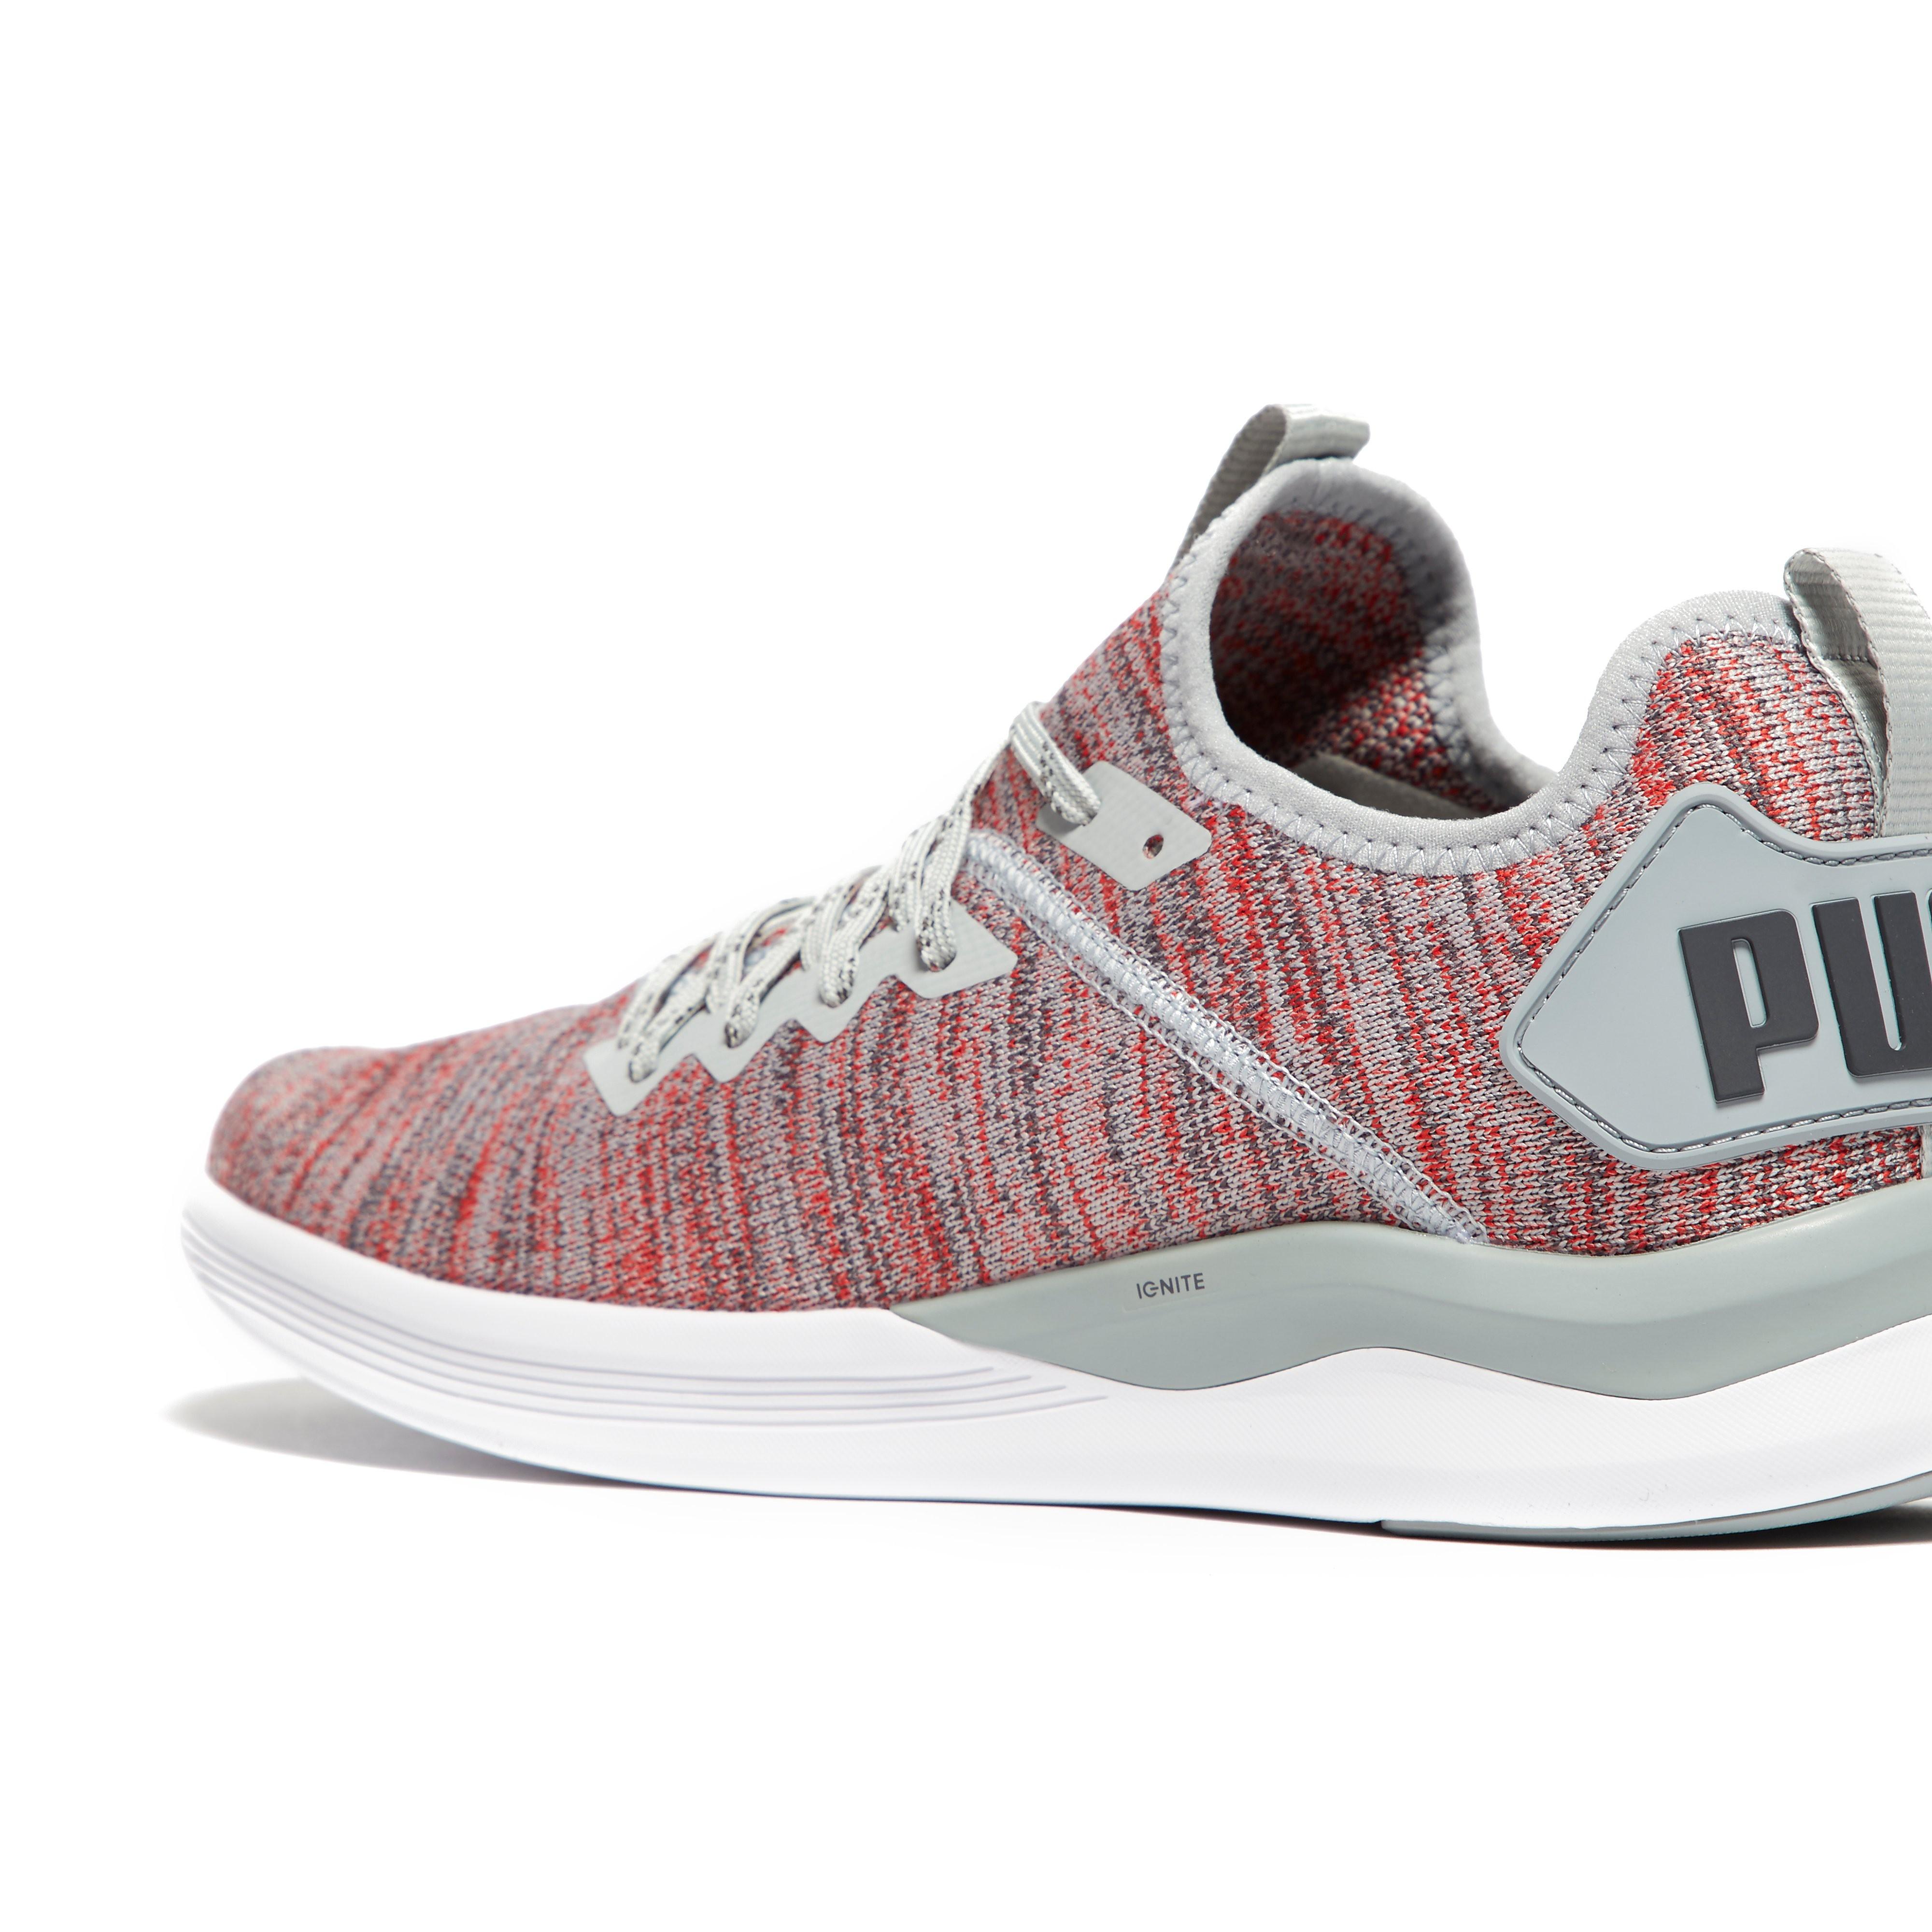 PUMA Flash Evo Men's Running Shoes